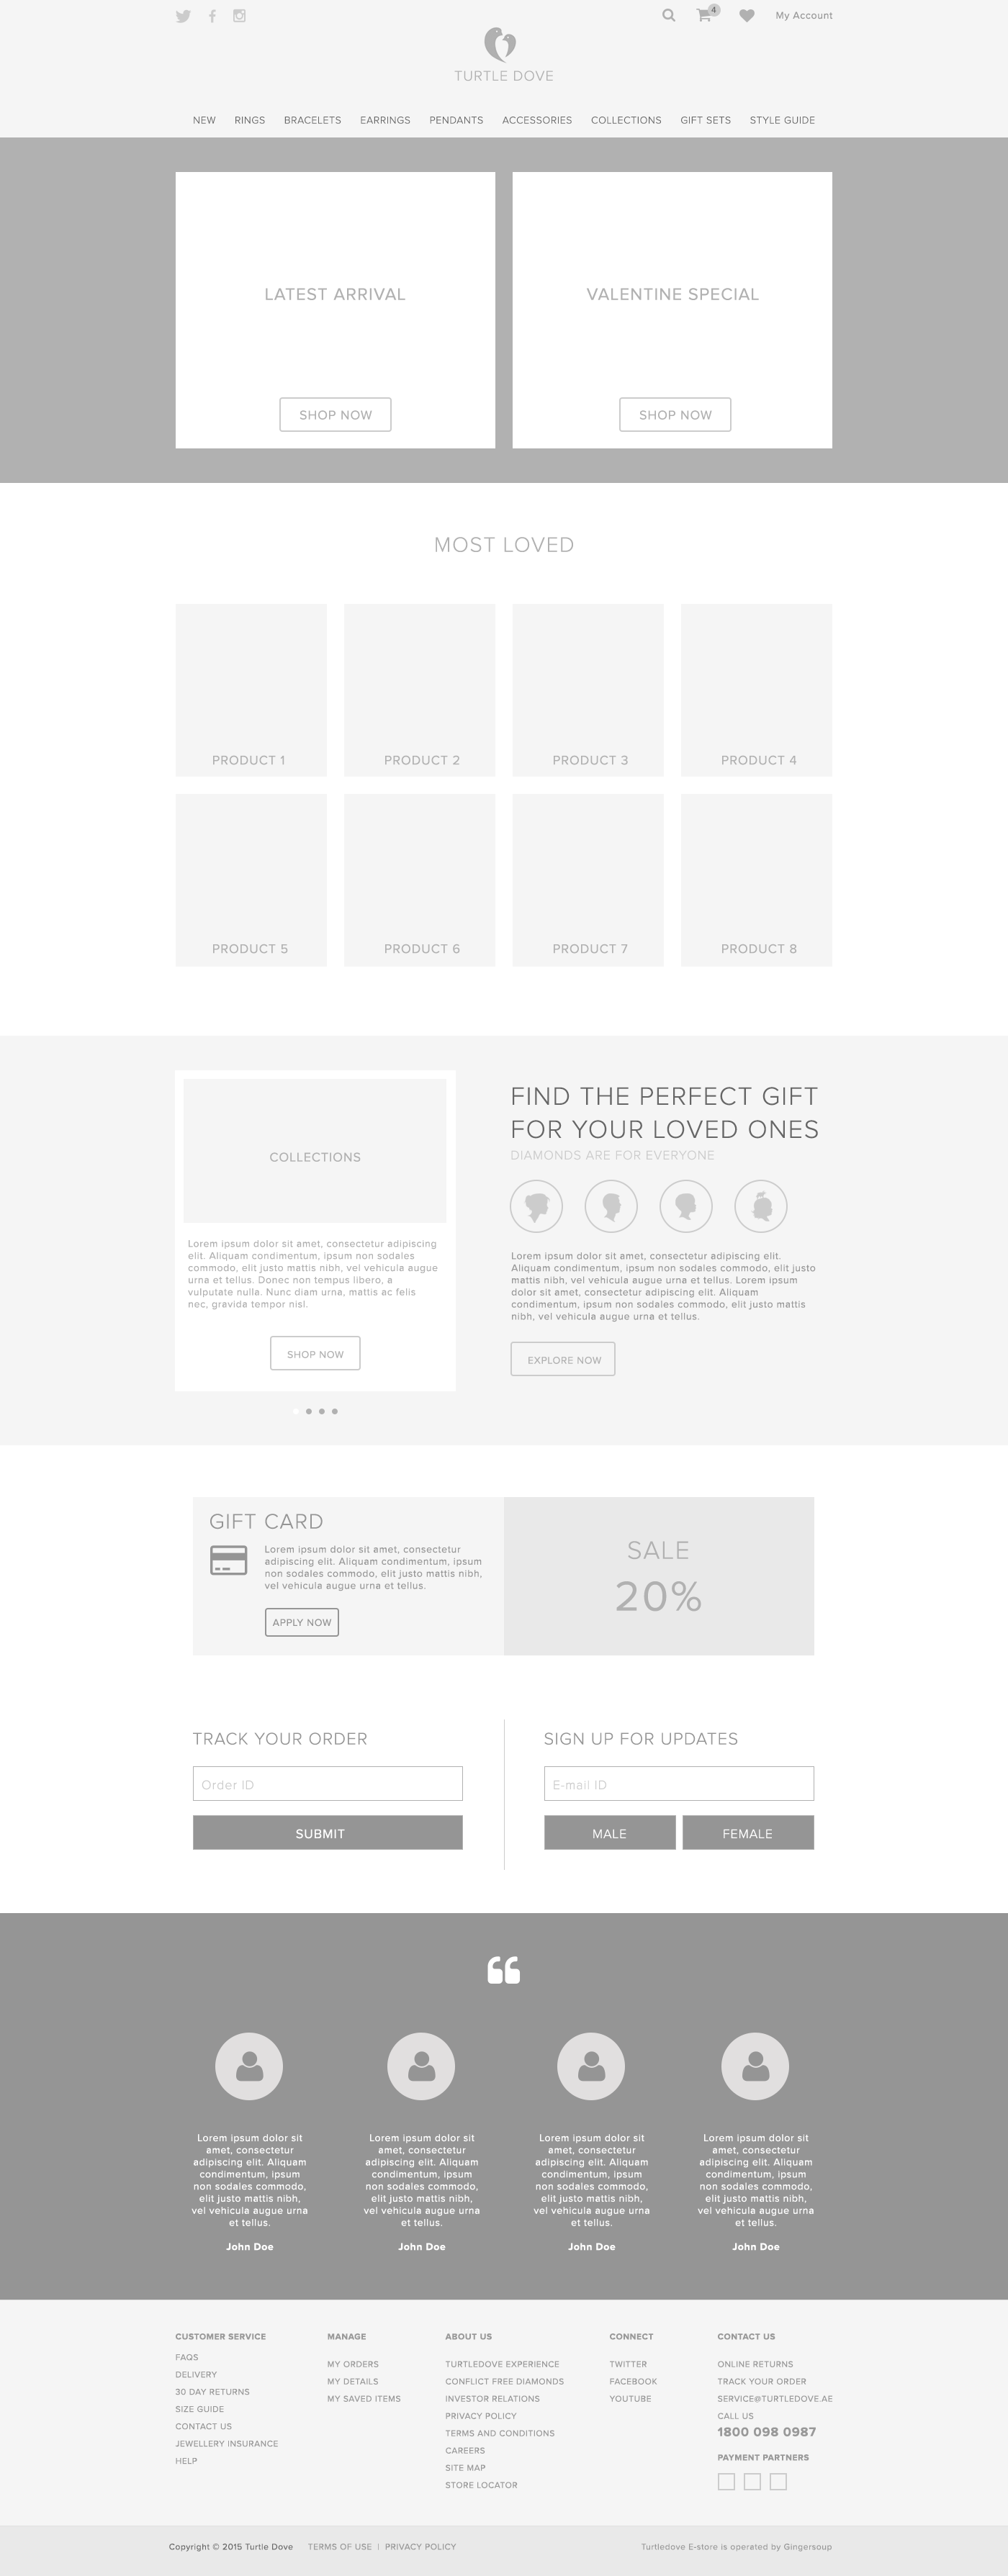 Best 20 Website Design Ideas For The Perfect Making Website Layout Design Or Website Desi Wordpress Website Design Website Design Layout Web Development Design